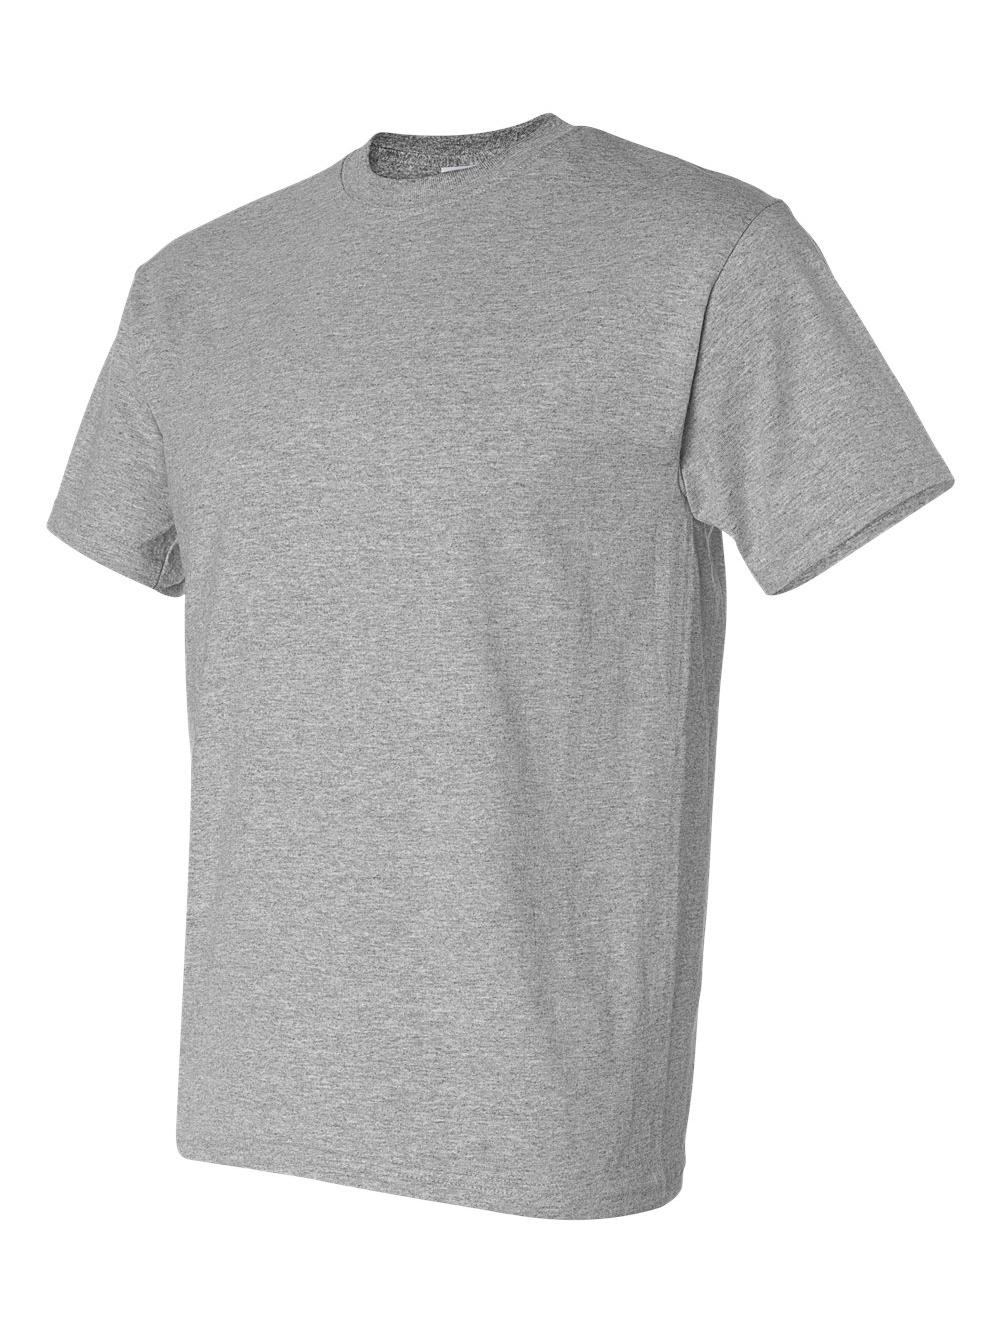 Round Neck T-Shirt,Diagonal Anchors Marine Fashion Personality Customization